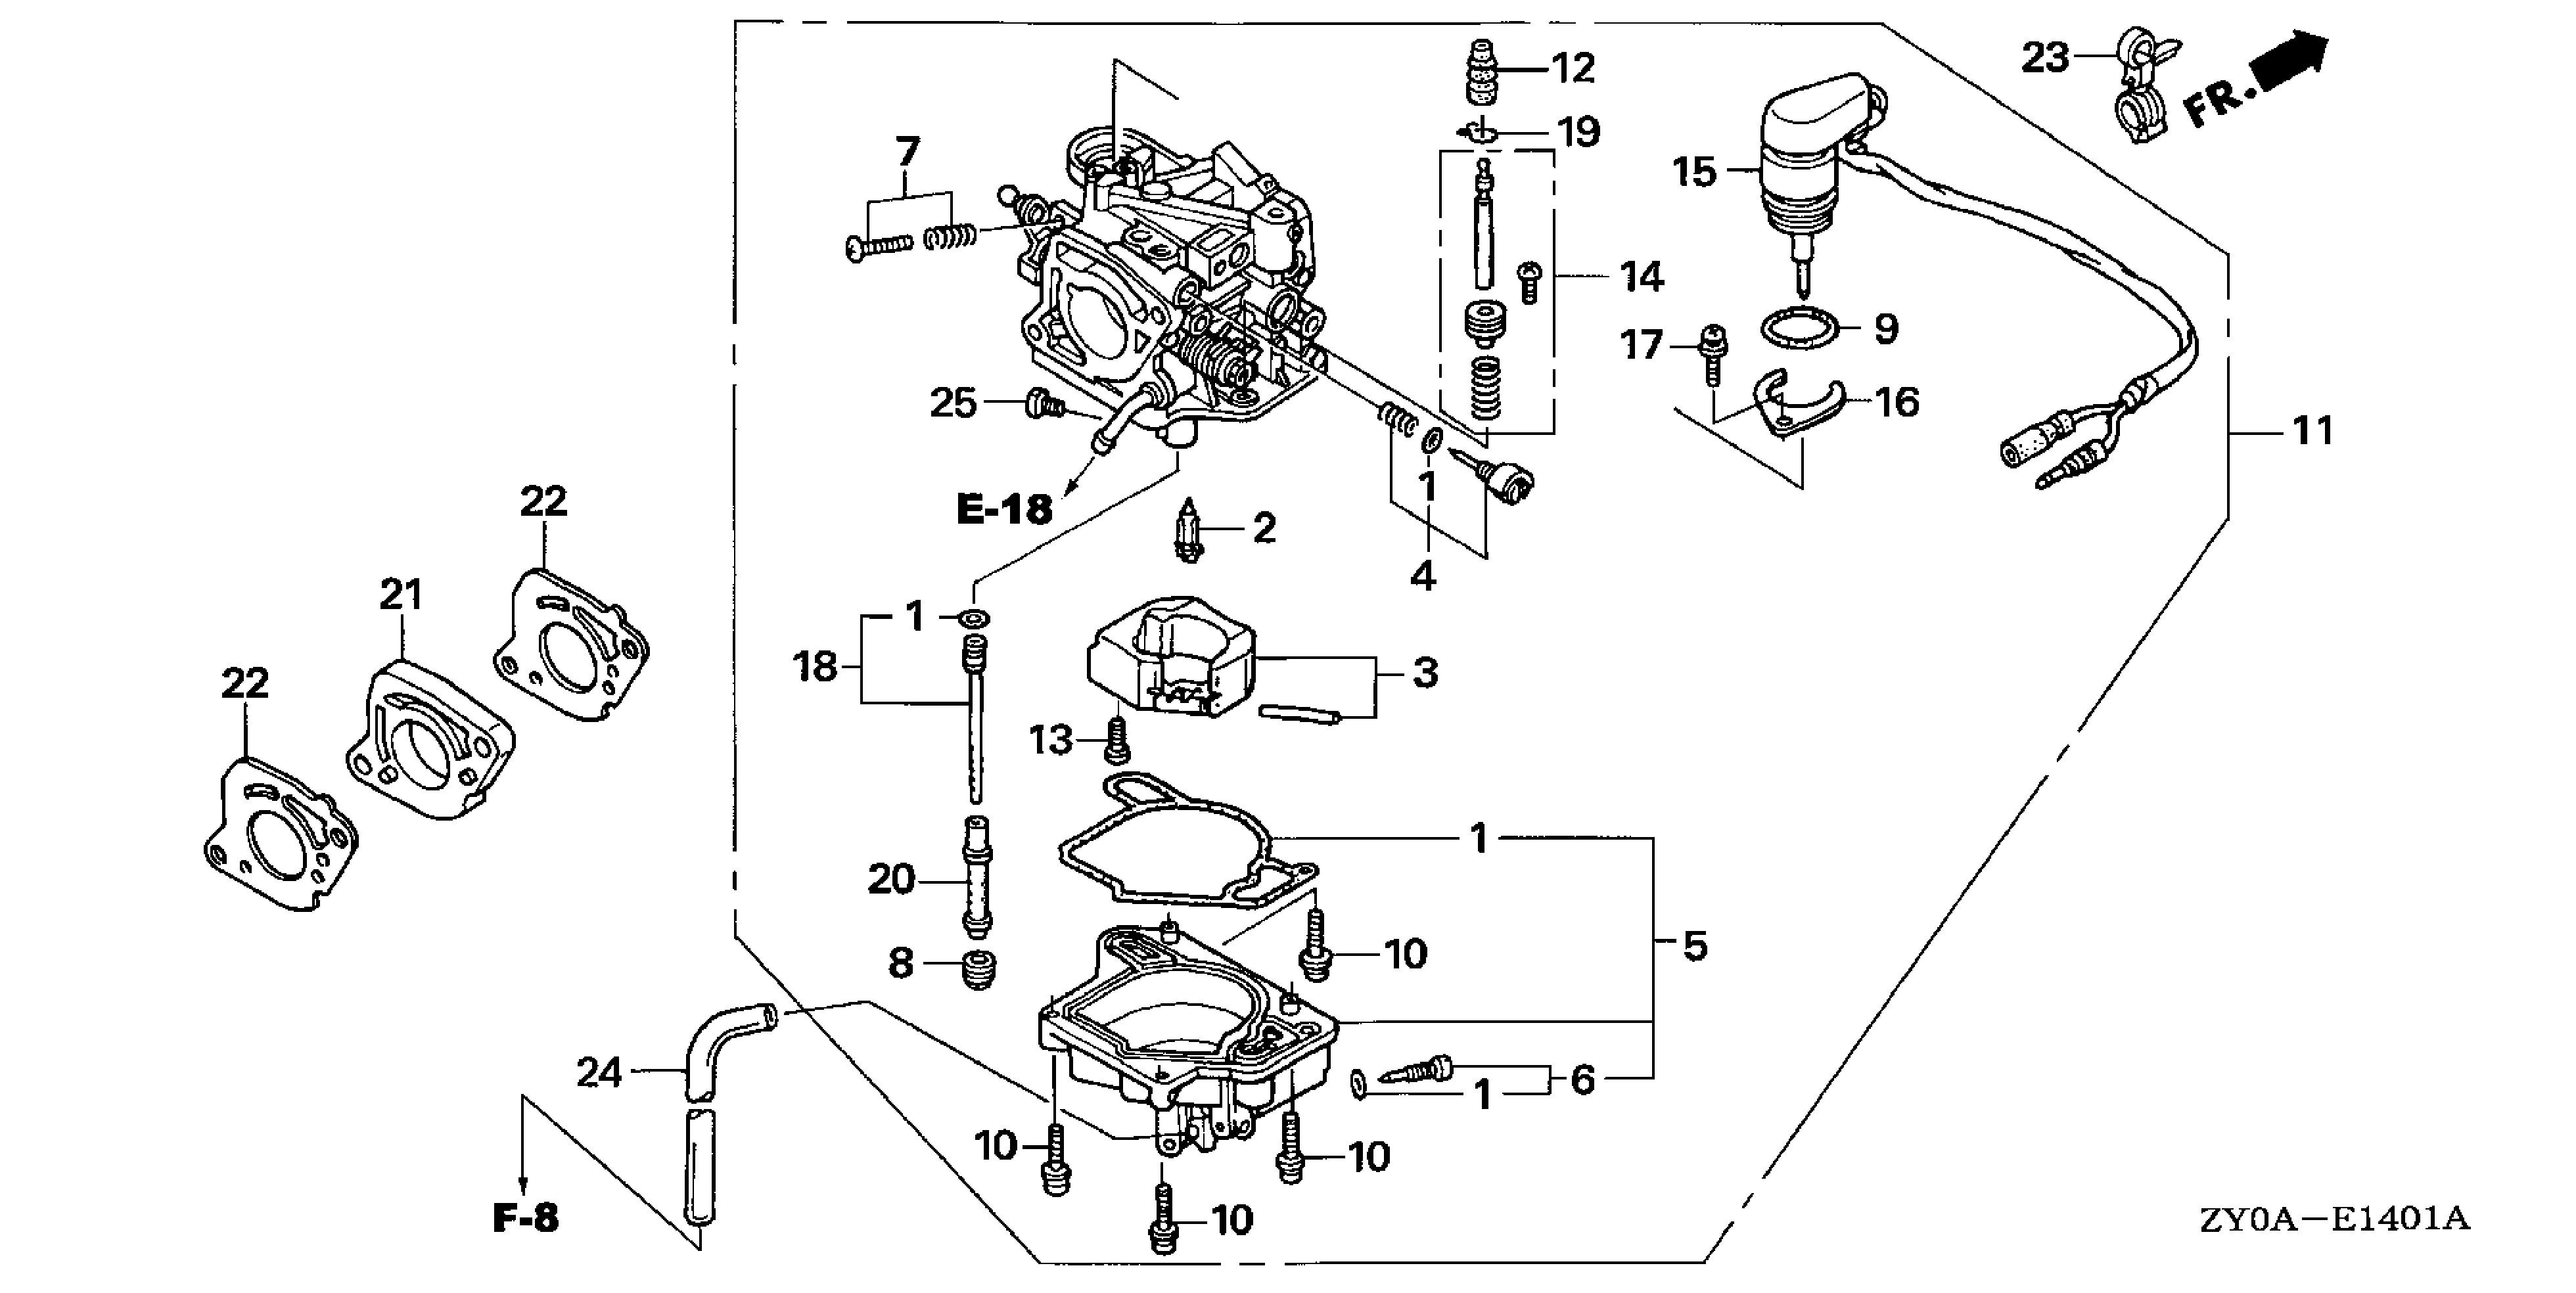 evinrude 15 hp parts diagram